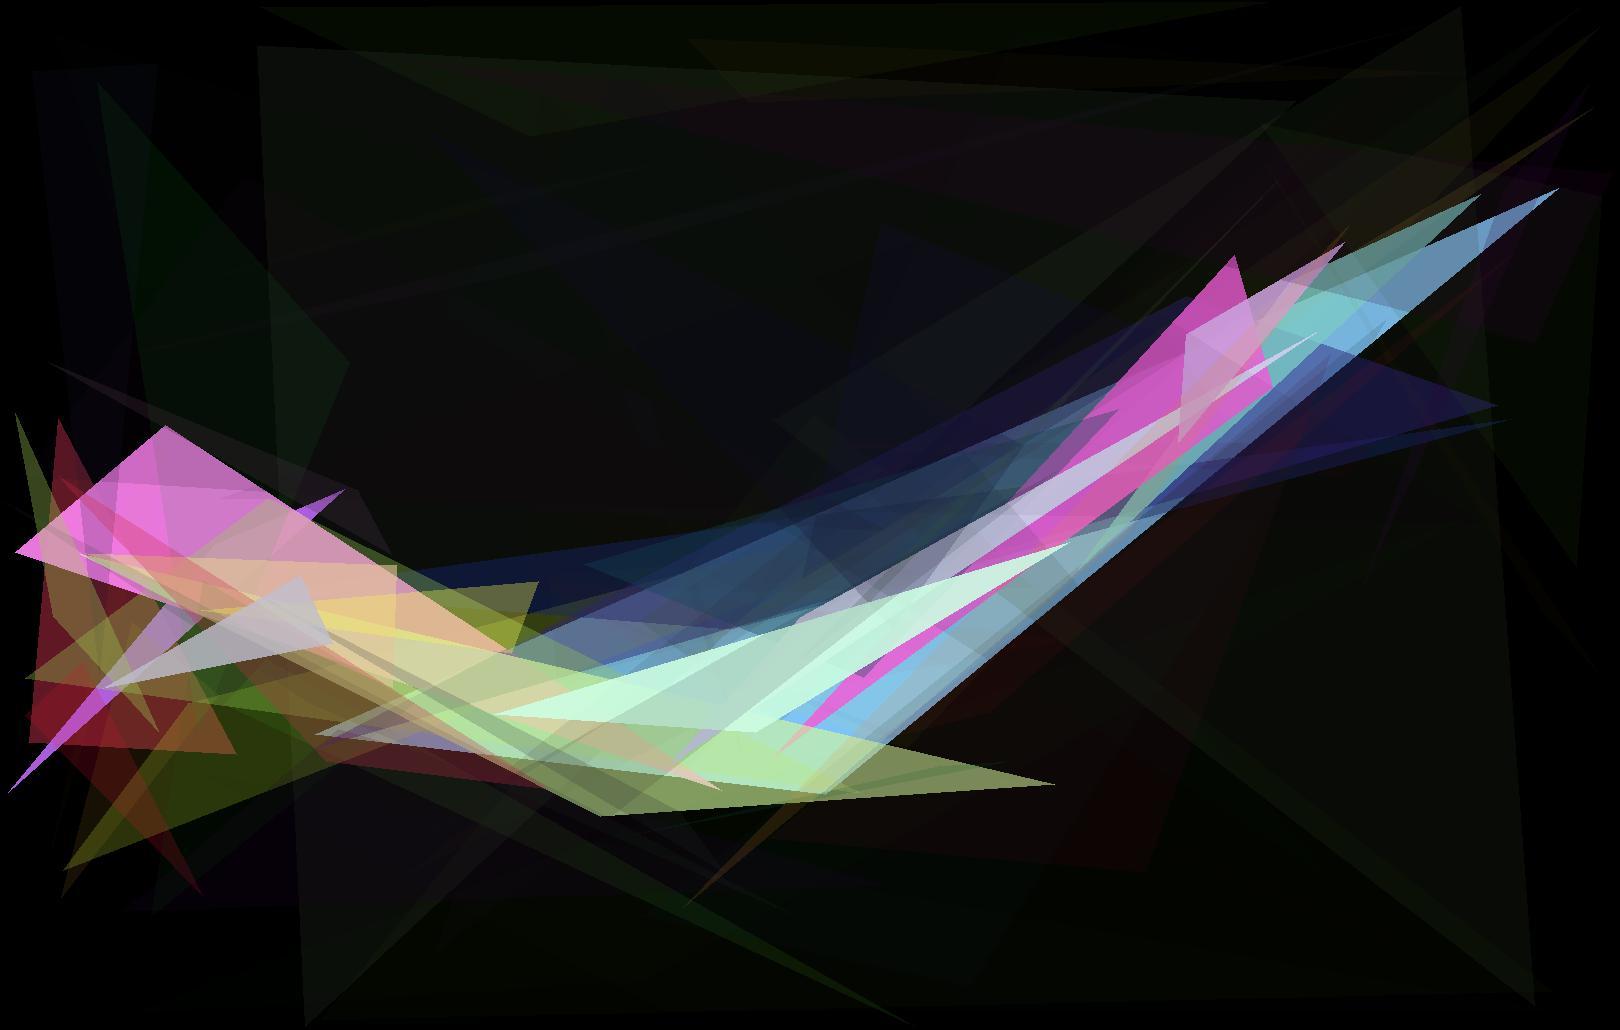 generation 8331-93.488487_per_cent-73_brush_strokes.jpg